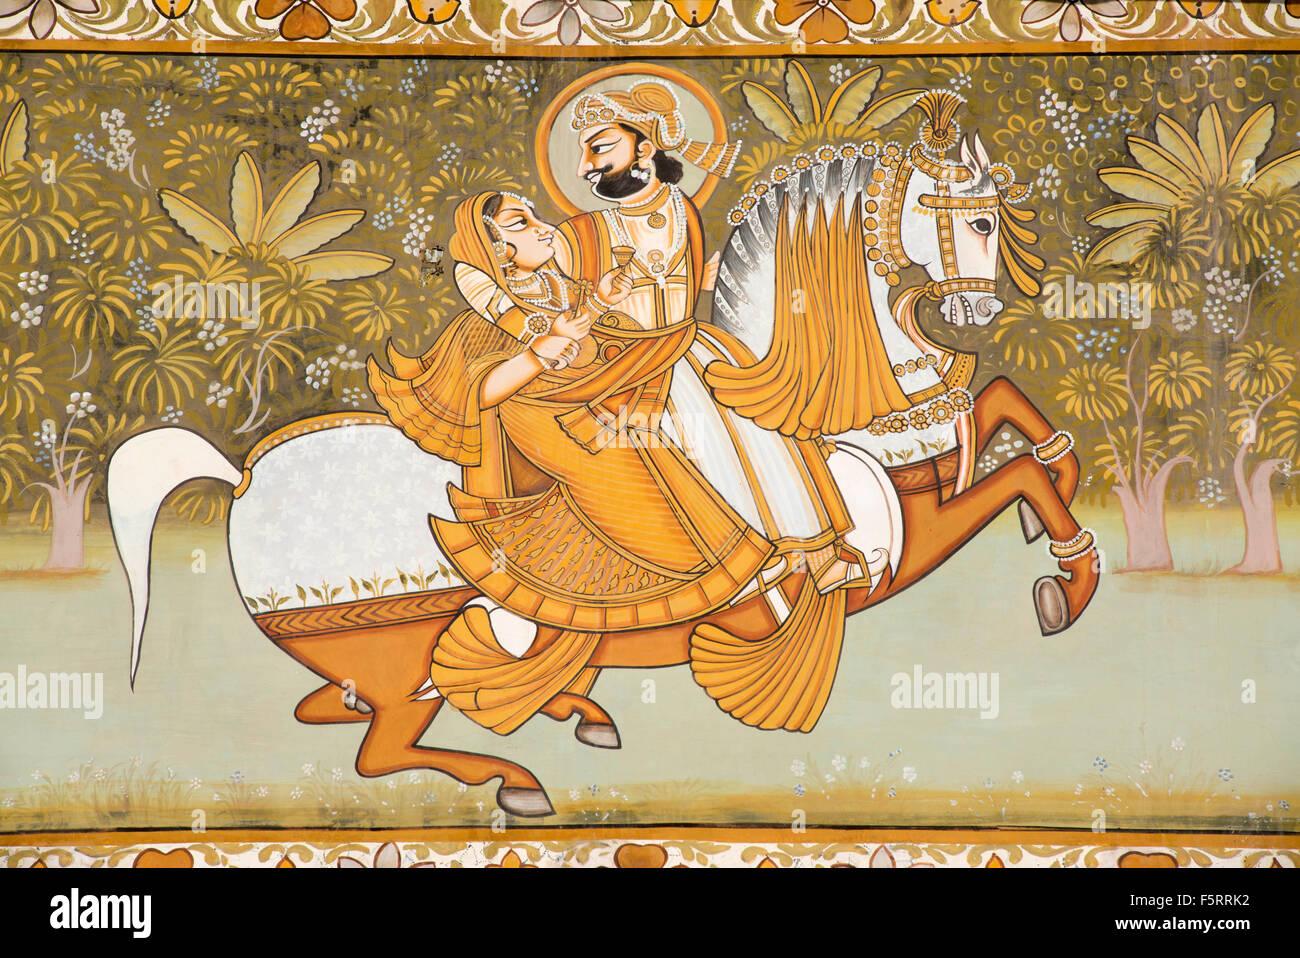 King with consort riding on horse, mehrangarh fort, jodhpur, rajasthan, india, asia - Stock Image